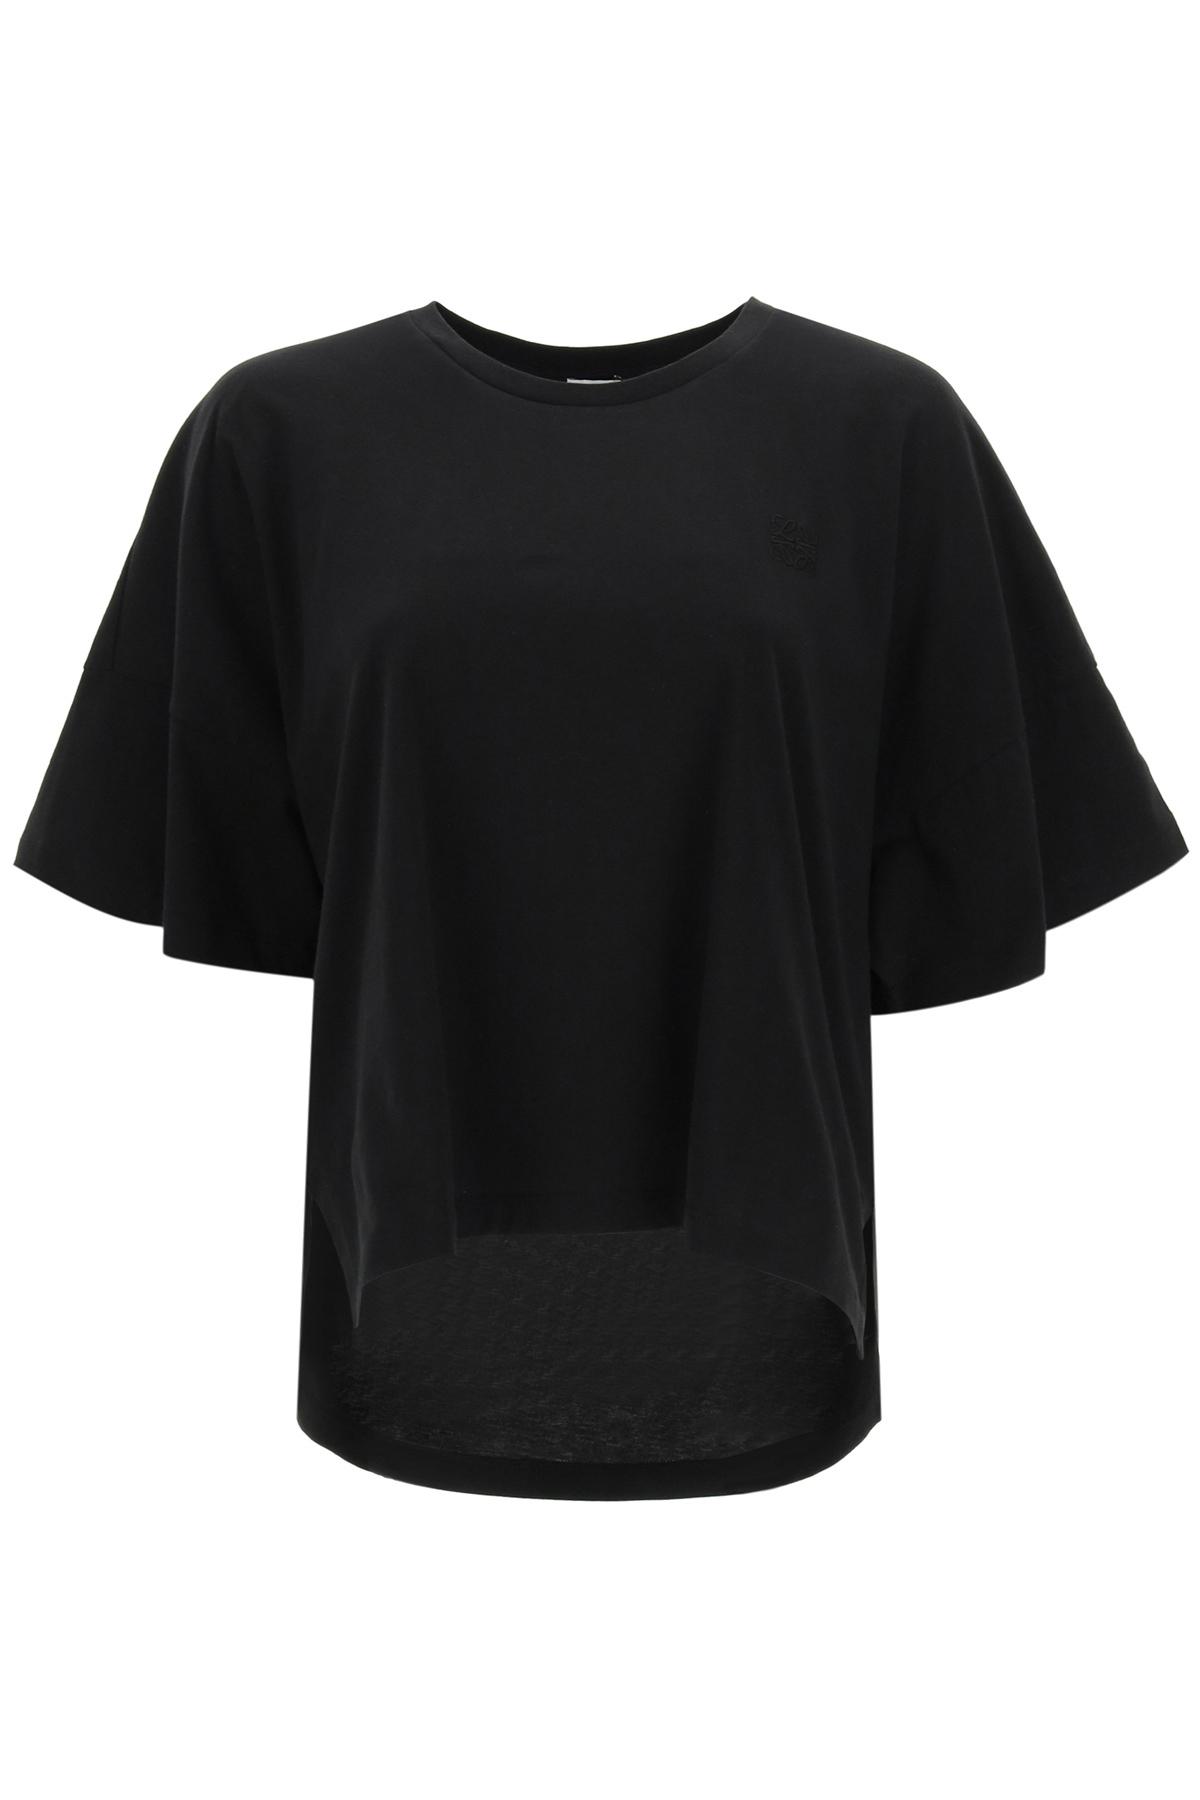 Loewe t-shirt oversize ricamo anagram